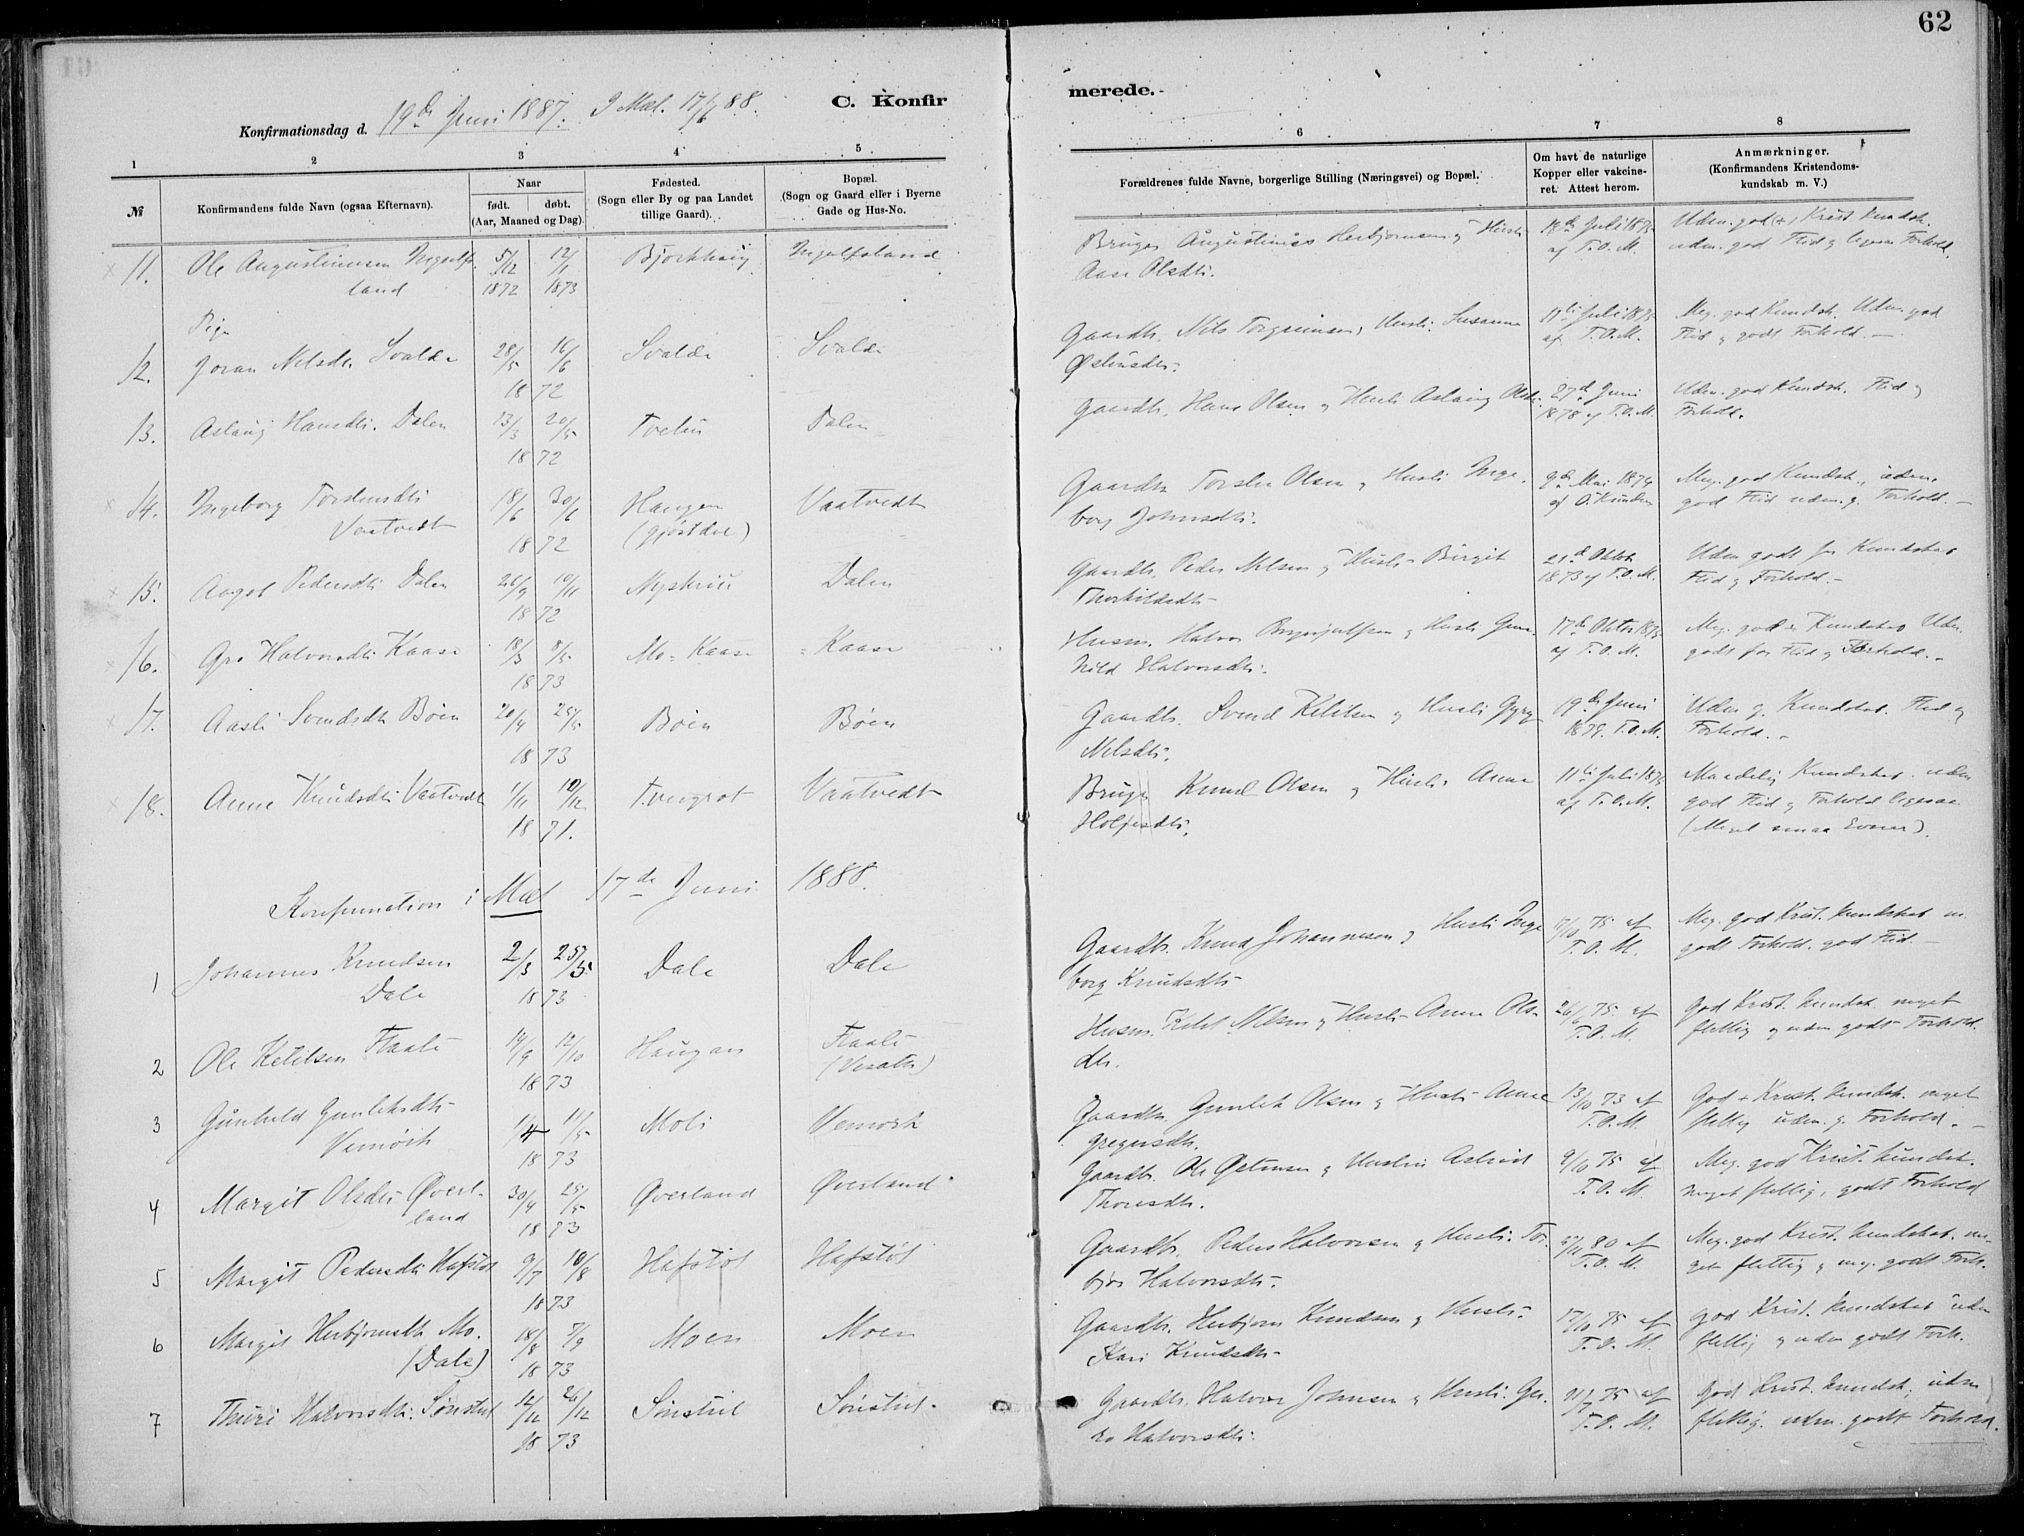 SAKO, Rjukan kirkebøker, F/Fa/L0001: Ministerialbok nr. 1, 1878-1912, s. 62